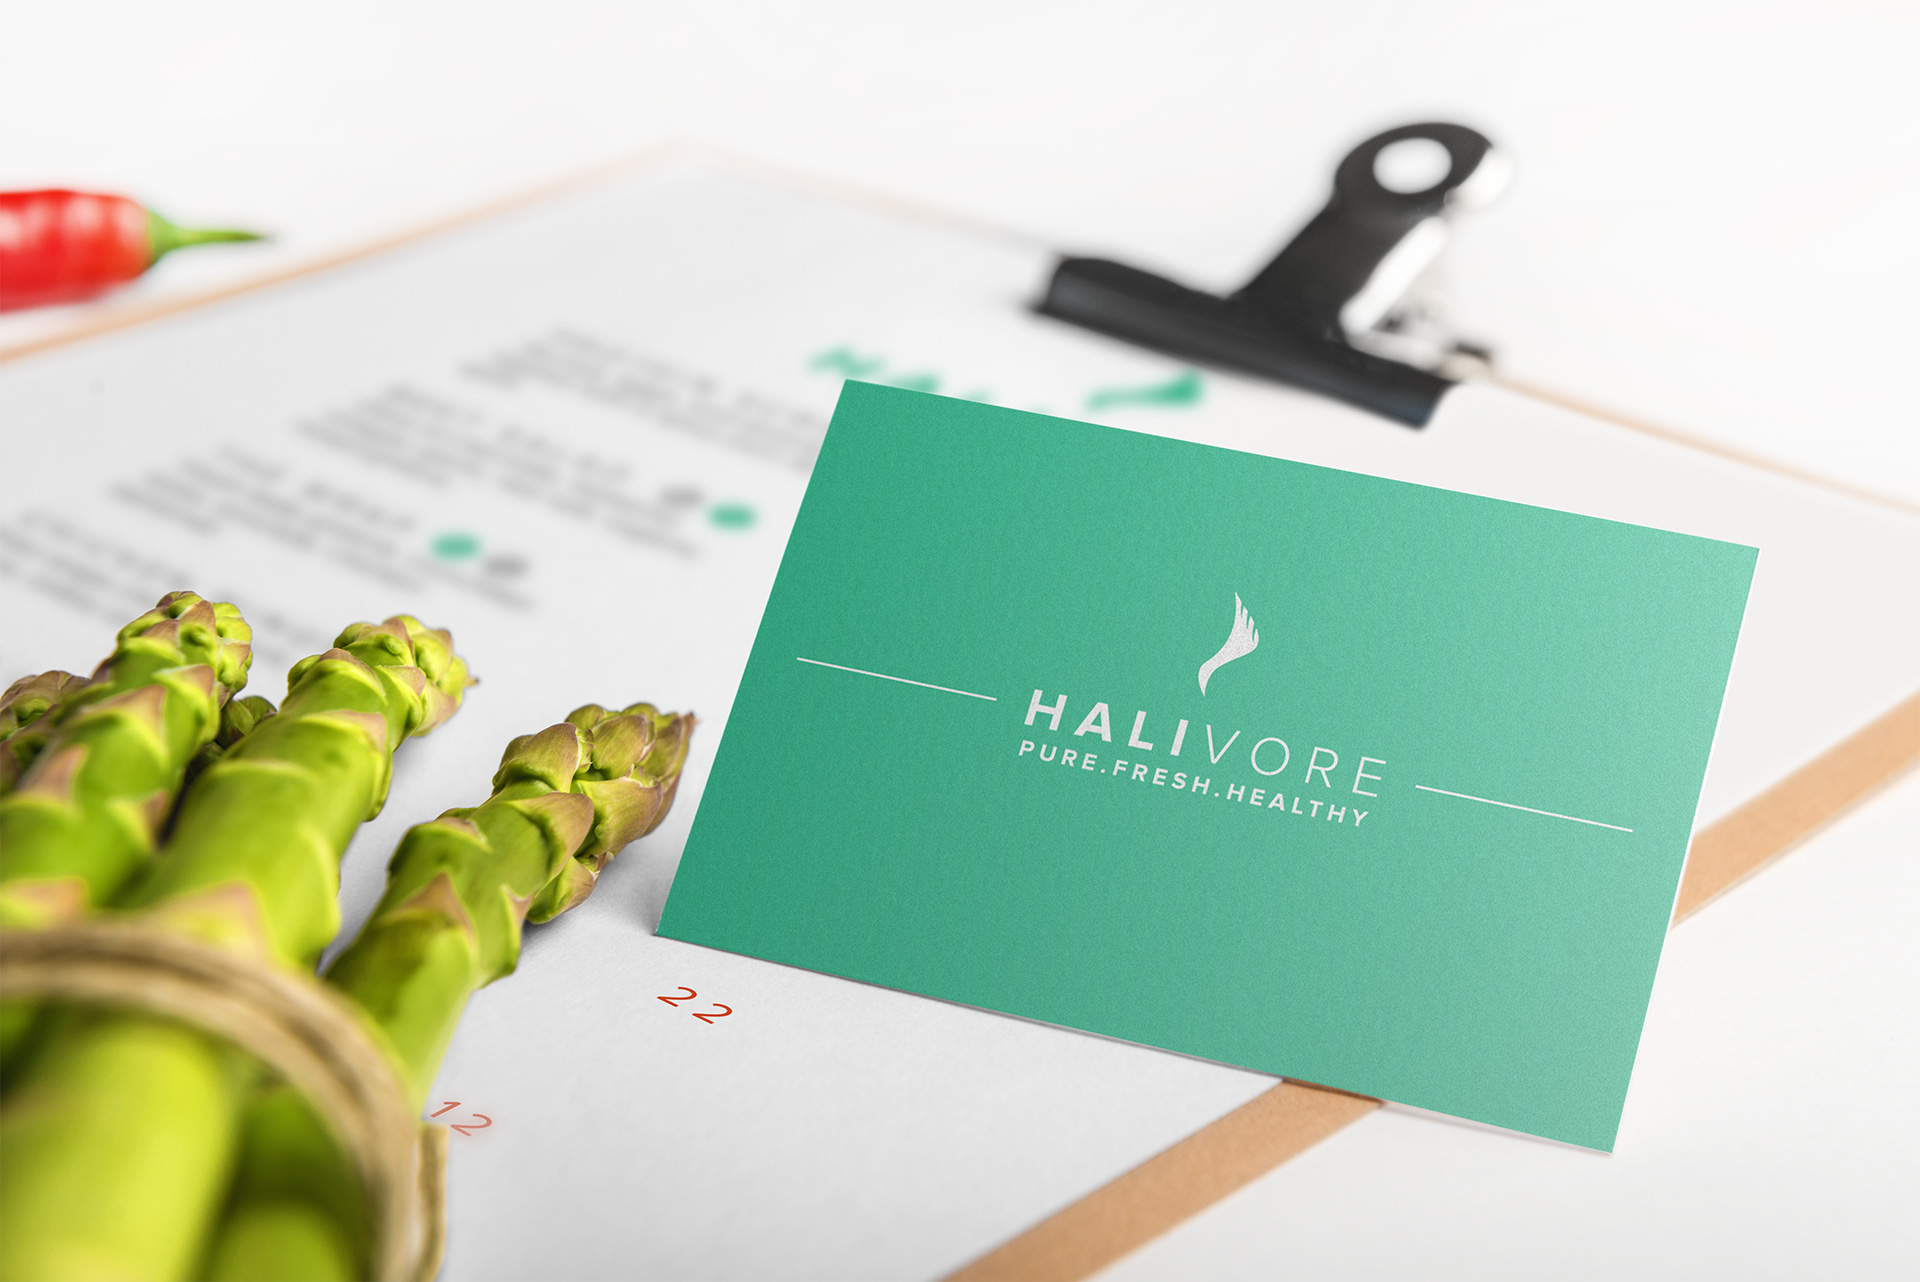 halivore_menu_mockup3